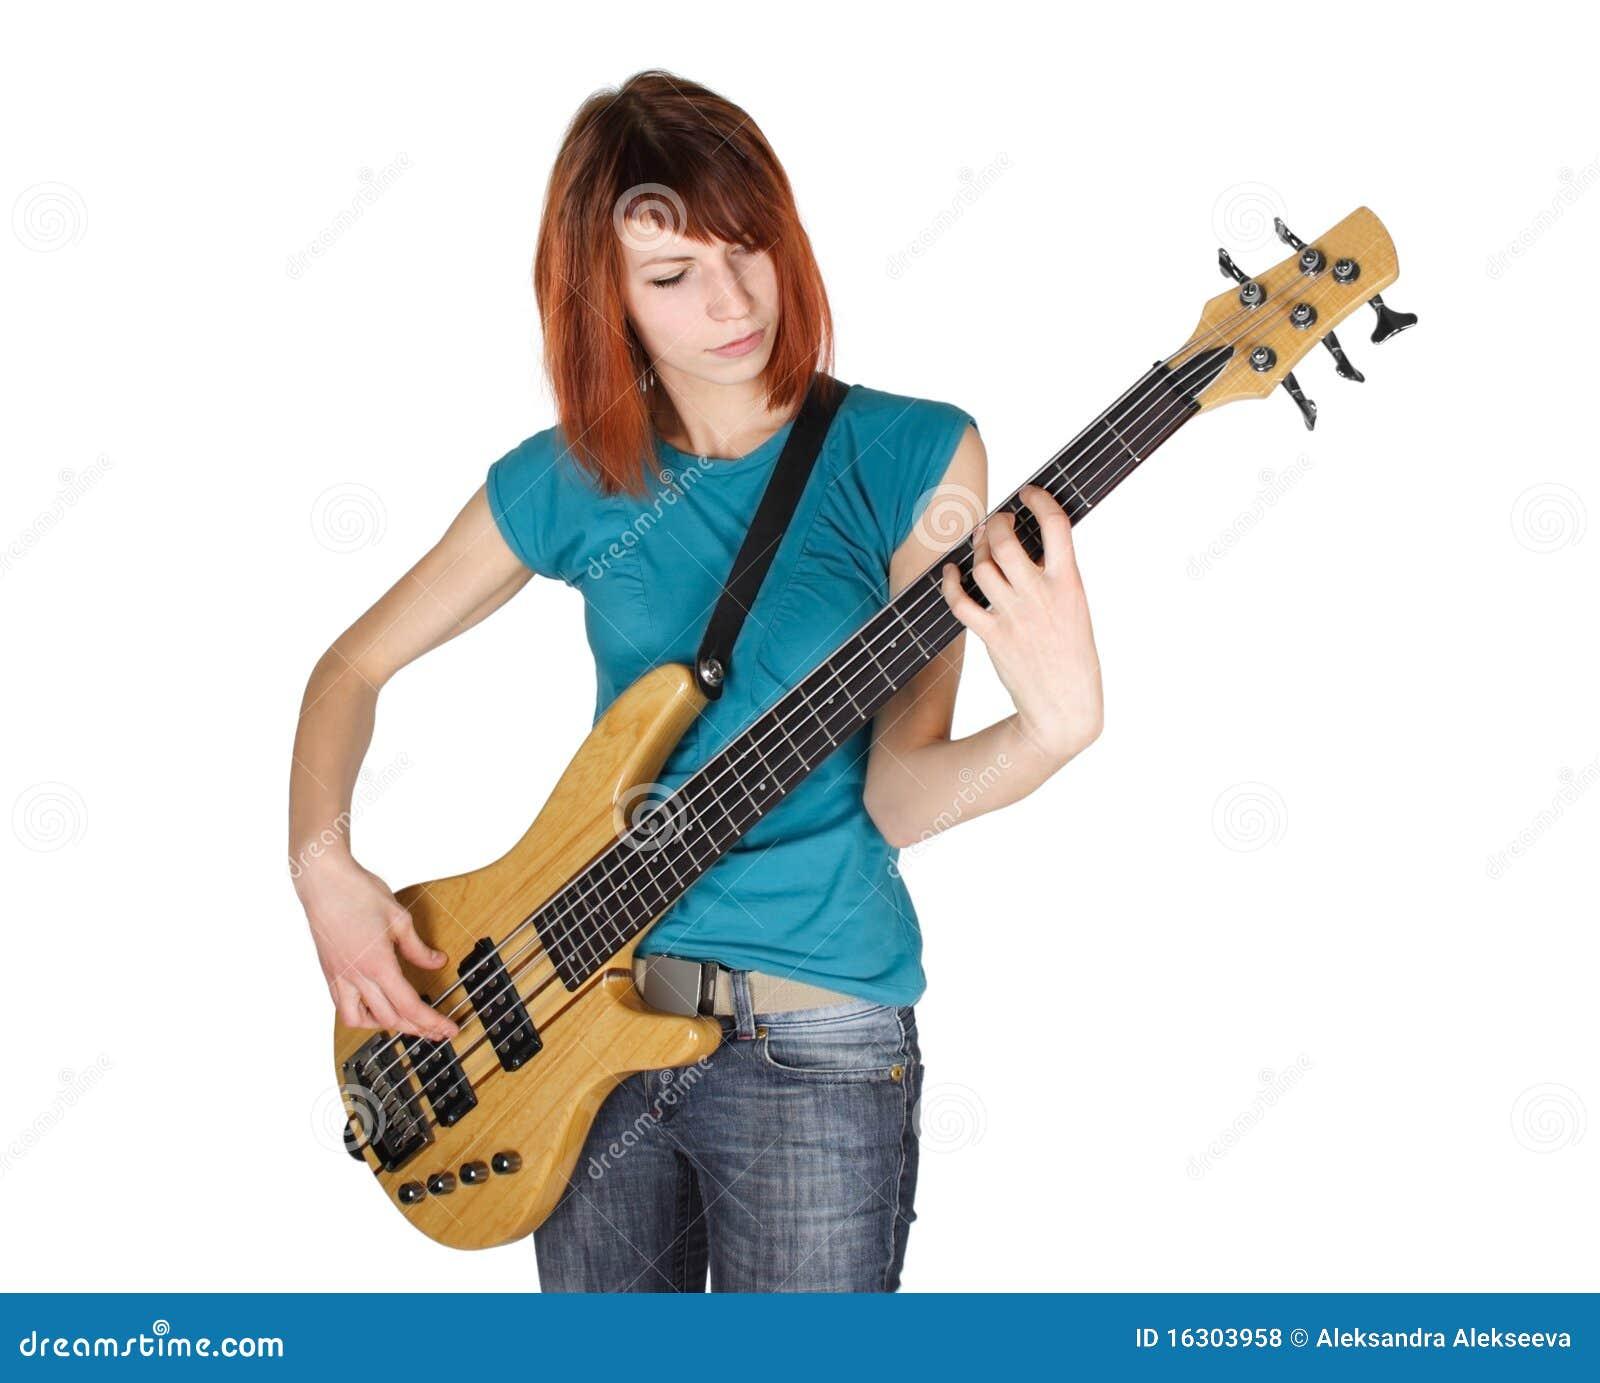 Redhead Girl Playing Bass Guitar Half Body Royalty Free